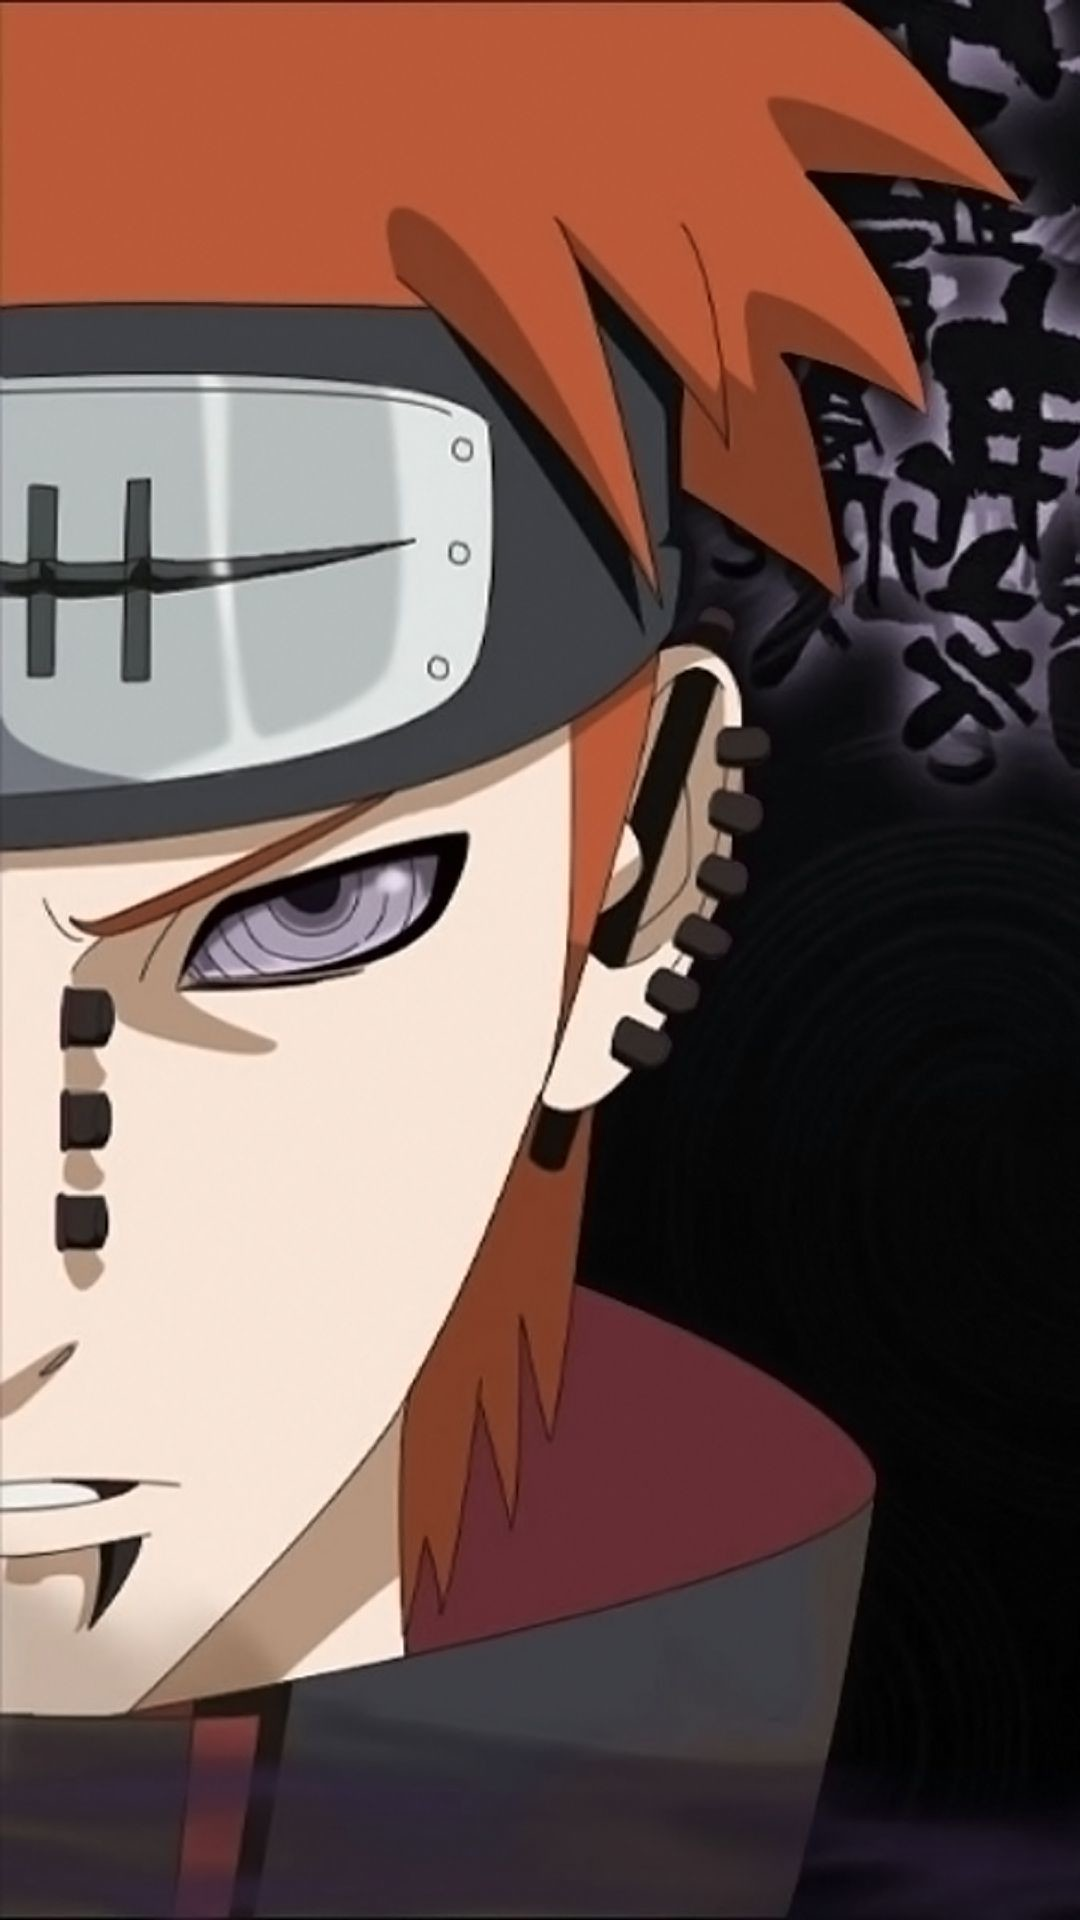 Anime Wallpaper Naruto Shippuden 2048x1152 Wallpaper Naruto Pictures To Pin On Pinterest